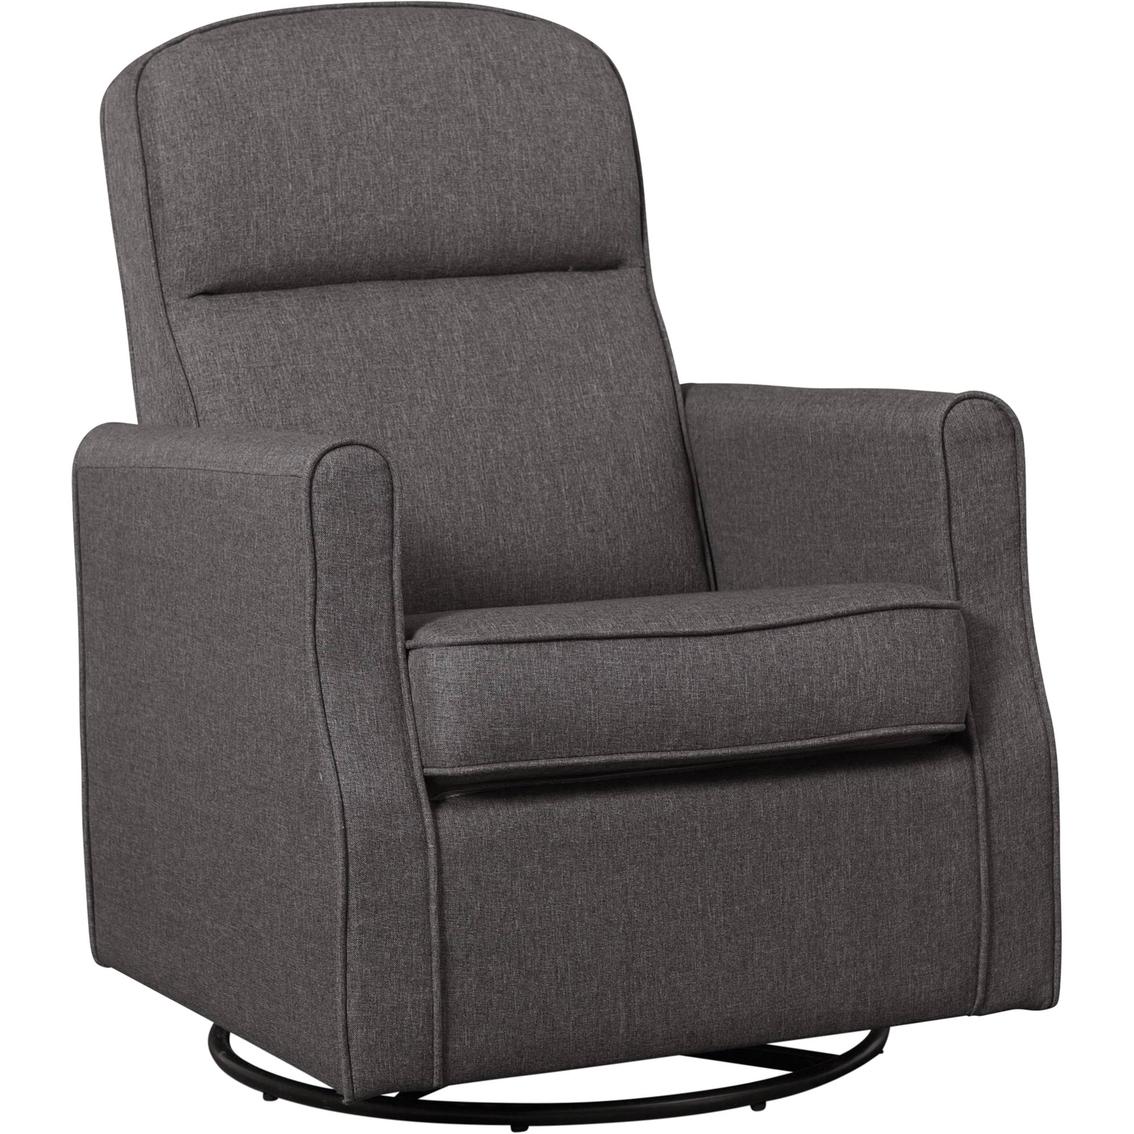 Super Delta Children Blair Slim Nursery Glider Swivel Rocker Chair Beatyapartments Chair Design Images Beatyapartmentscom